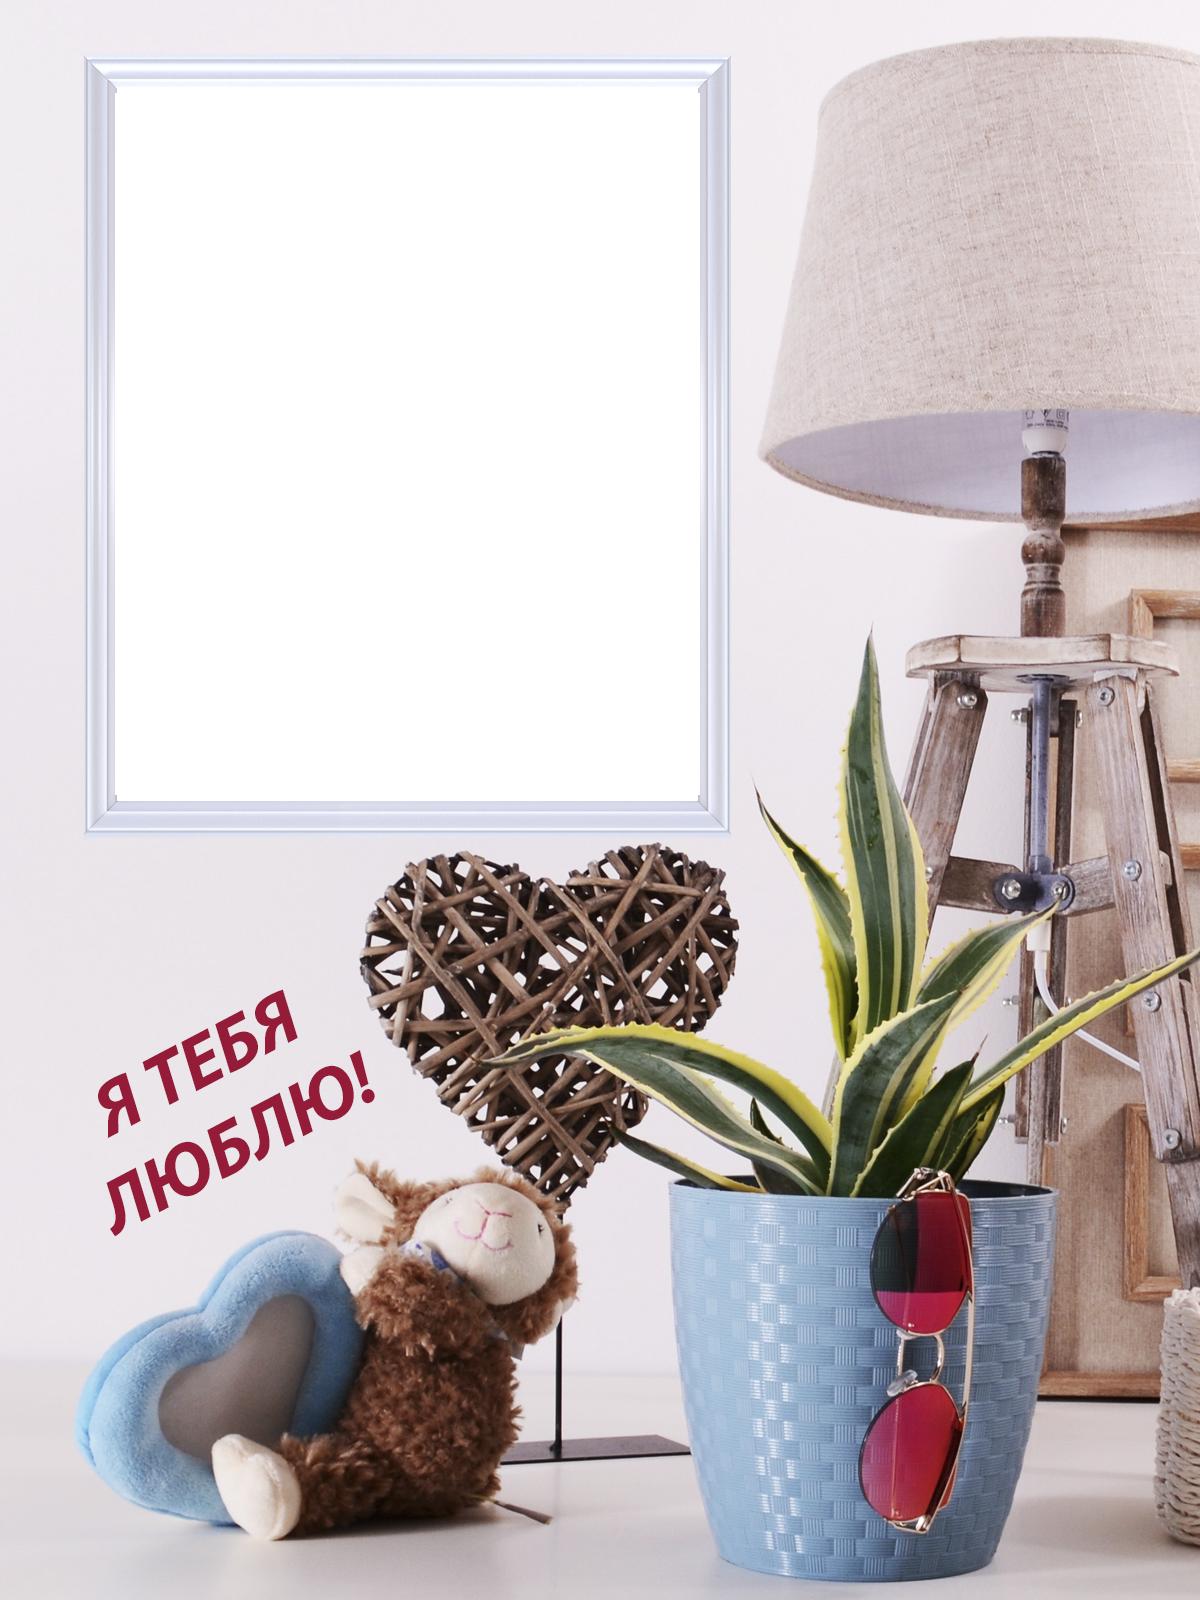 Фоторамка Романтическая рамка Фоторамка для фотошопа, PNG шаблон.